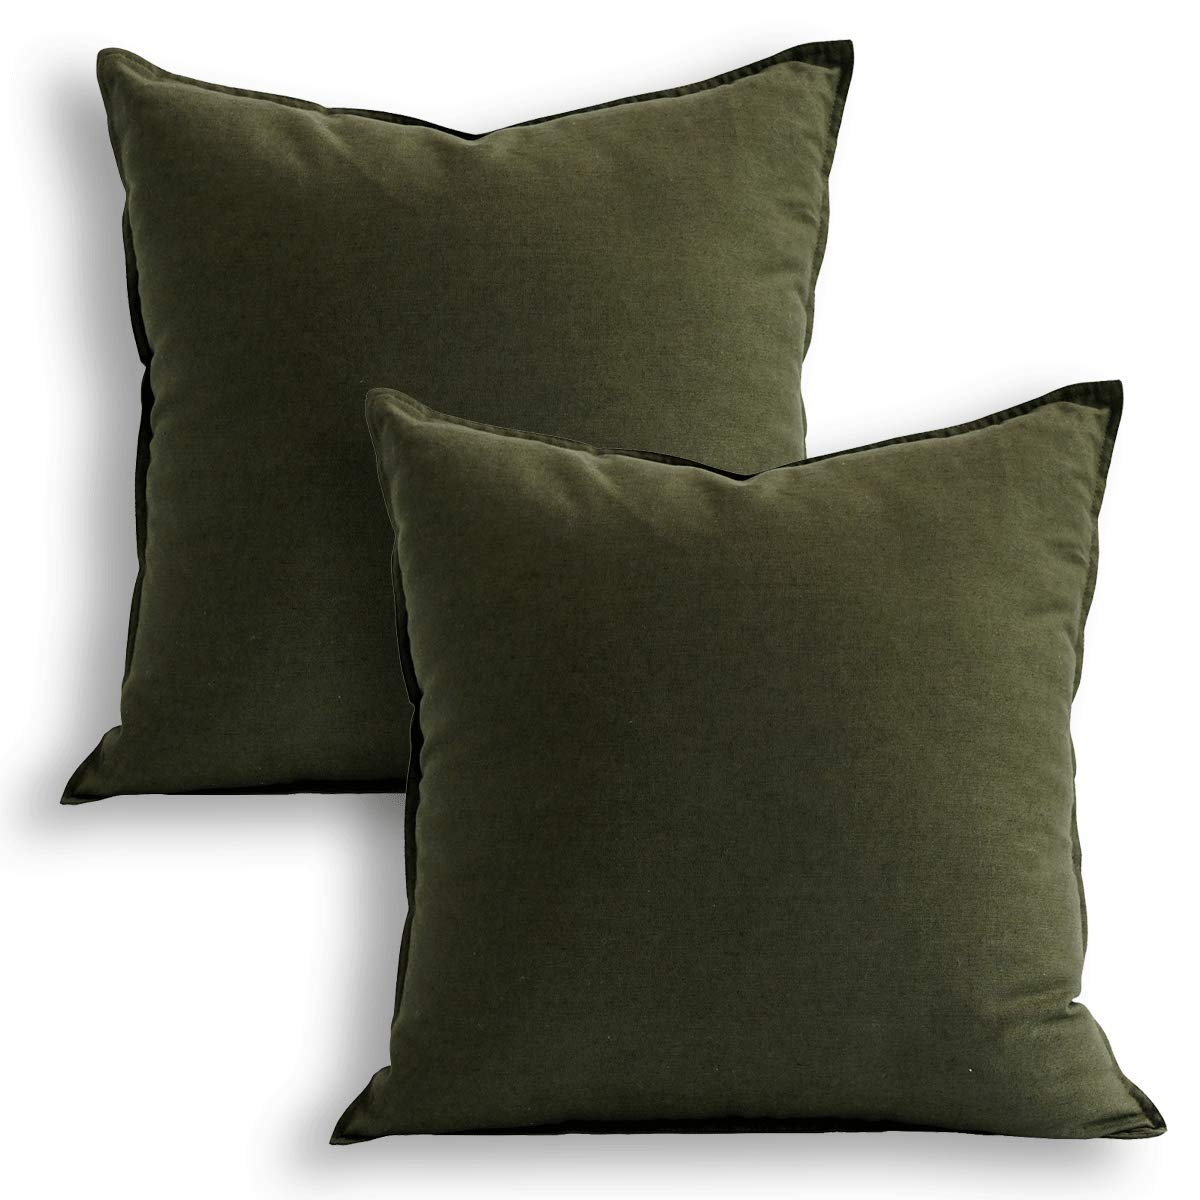 "jeanerlorコットンリネン正方形装飾スロー枕カバークッションカバーとツインニードルステッチonエッジ、ソファ、椅子、ソファ、リビングルーム、ベンチ、キッズ、子供。 24xFF02;x24xFF02;2 pack グリーン CALJEANGE069 B07BVRF5BG オリーブグリーン 24""x24""2 pack"